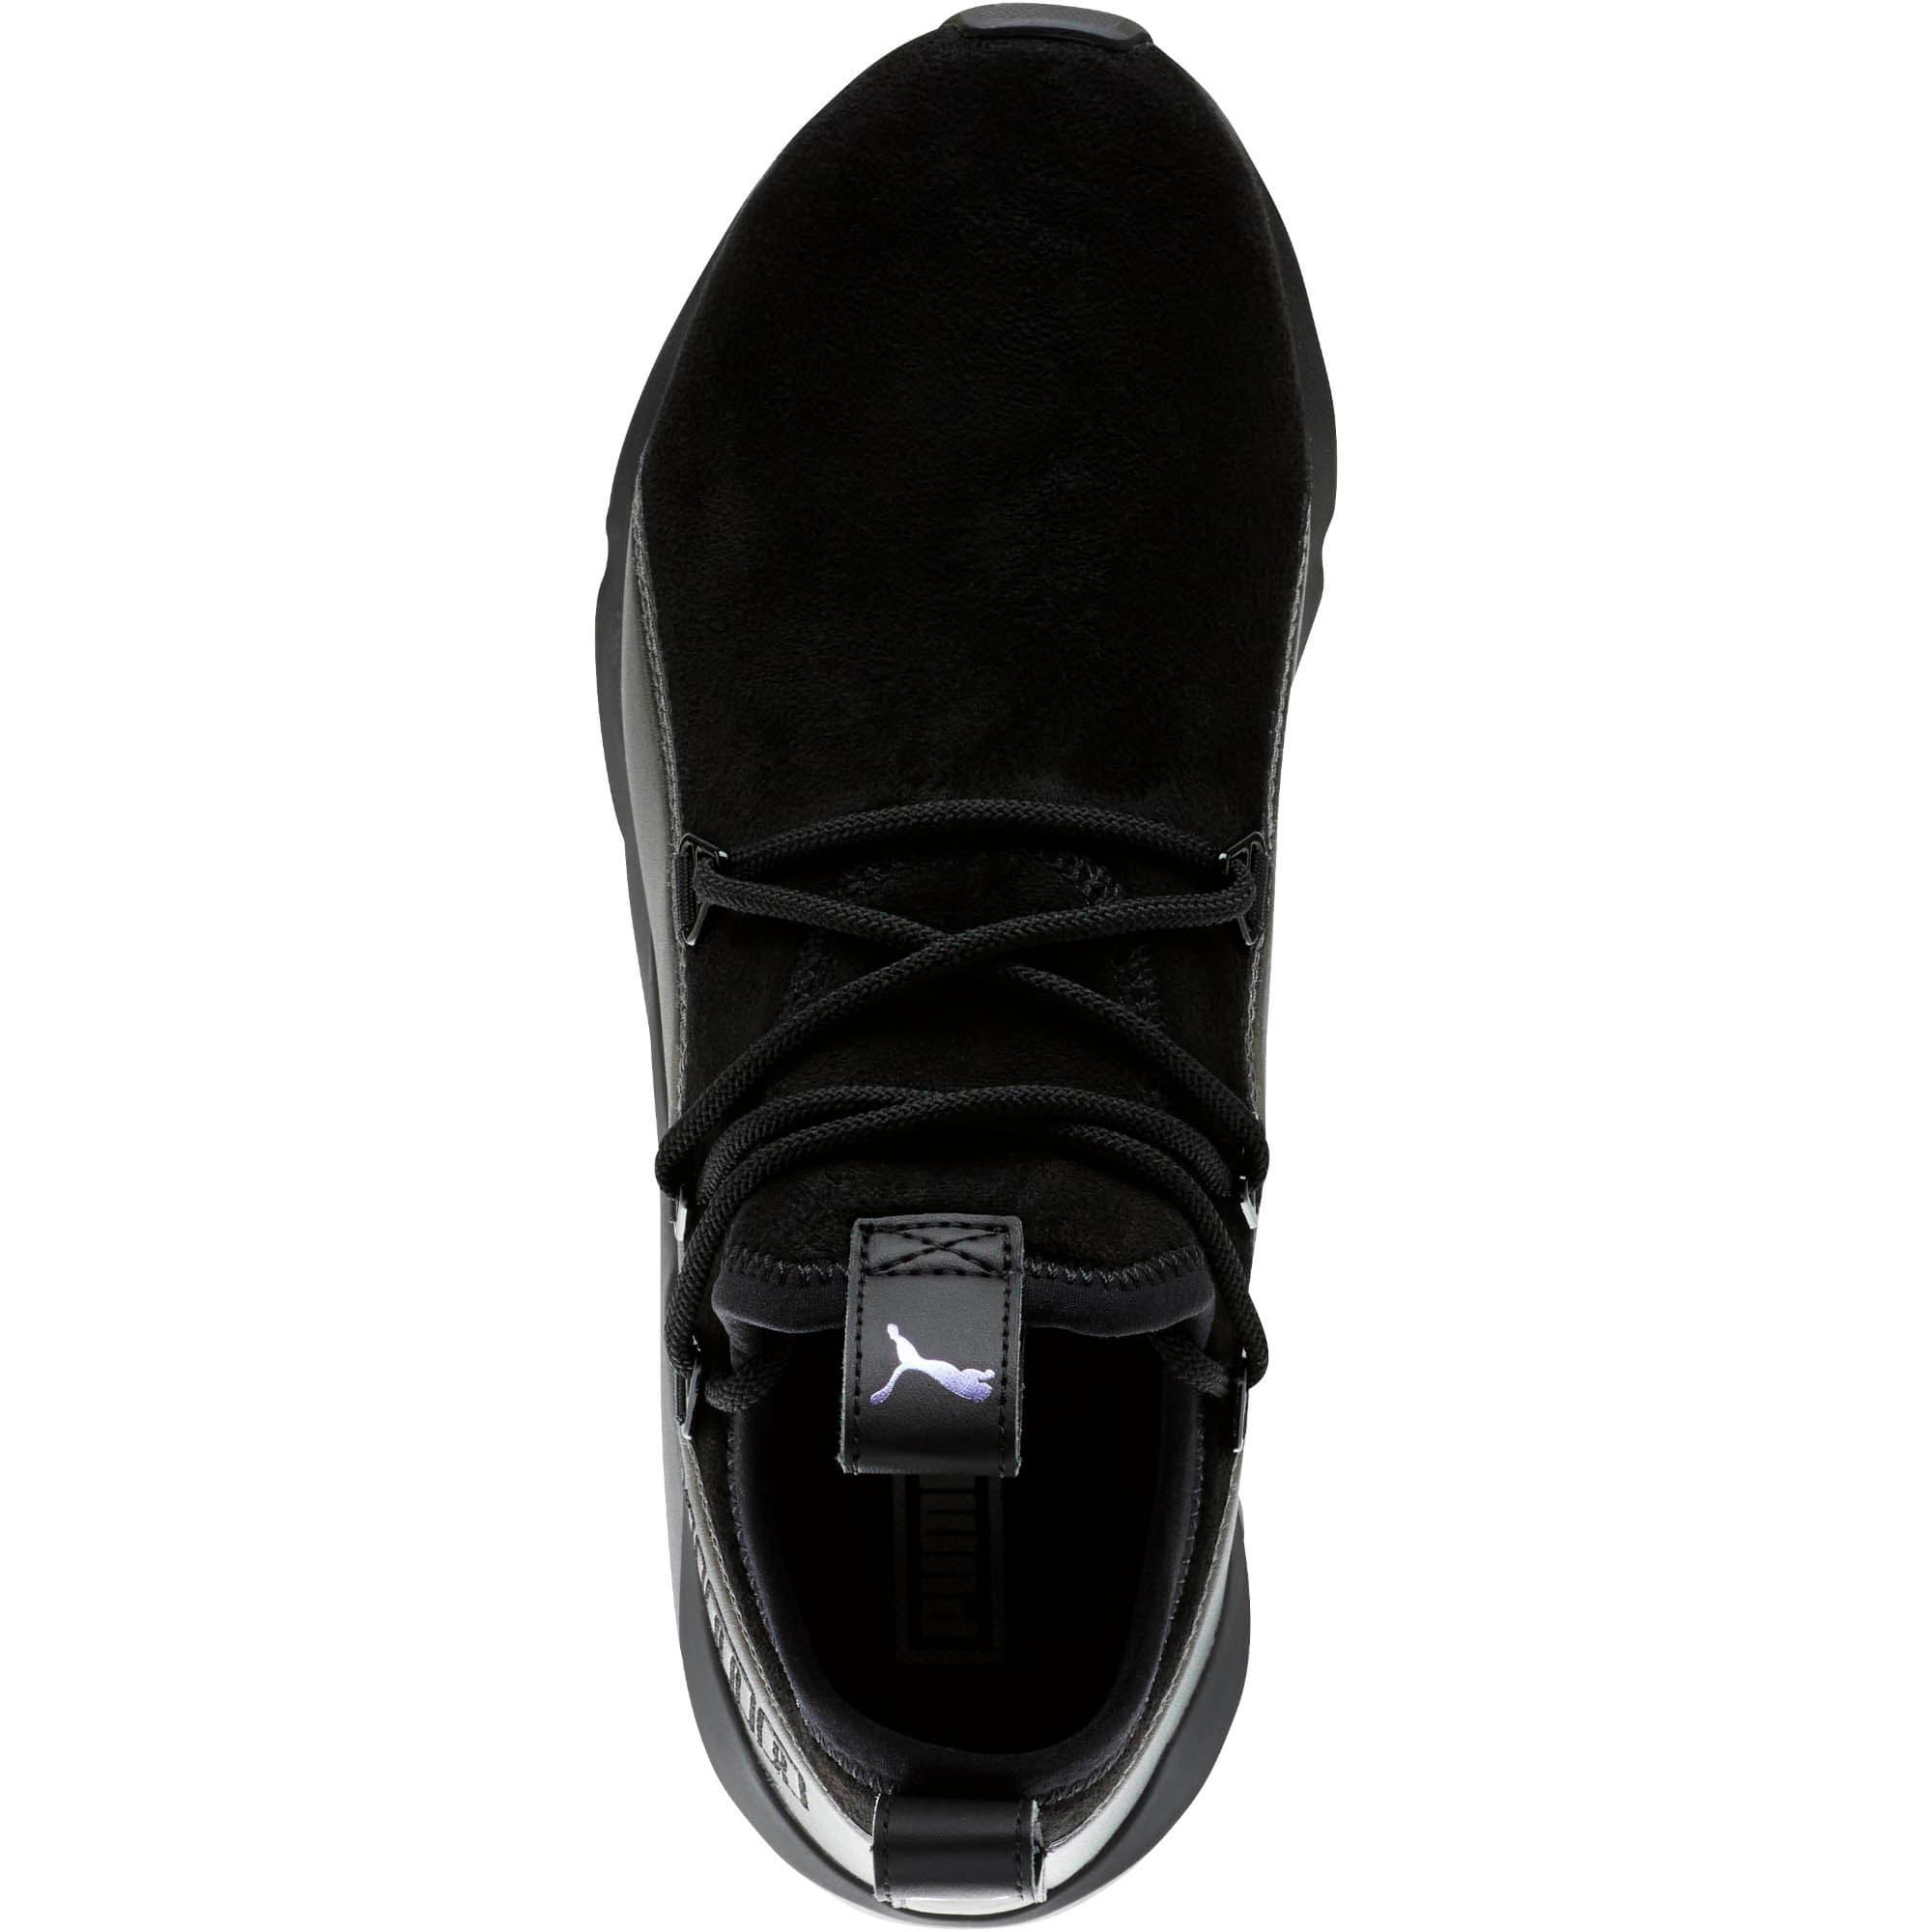 Miniatura 5 de Zapatos deportivosMuse 2 Twilight de mujer, Puma Black-Puma Black, mediano